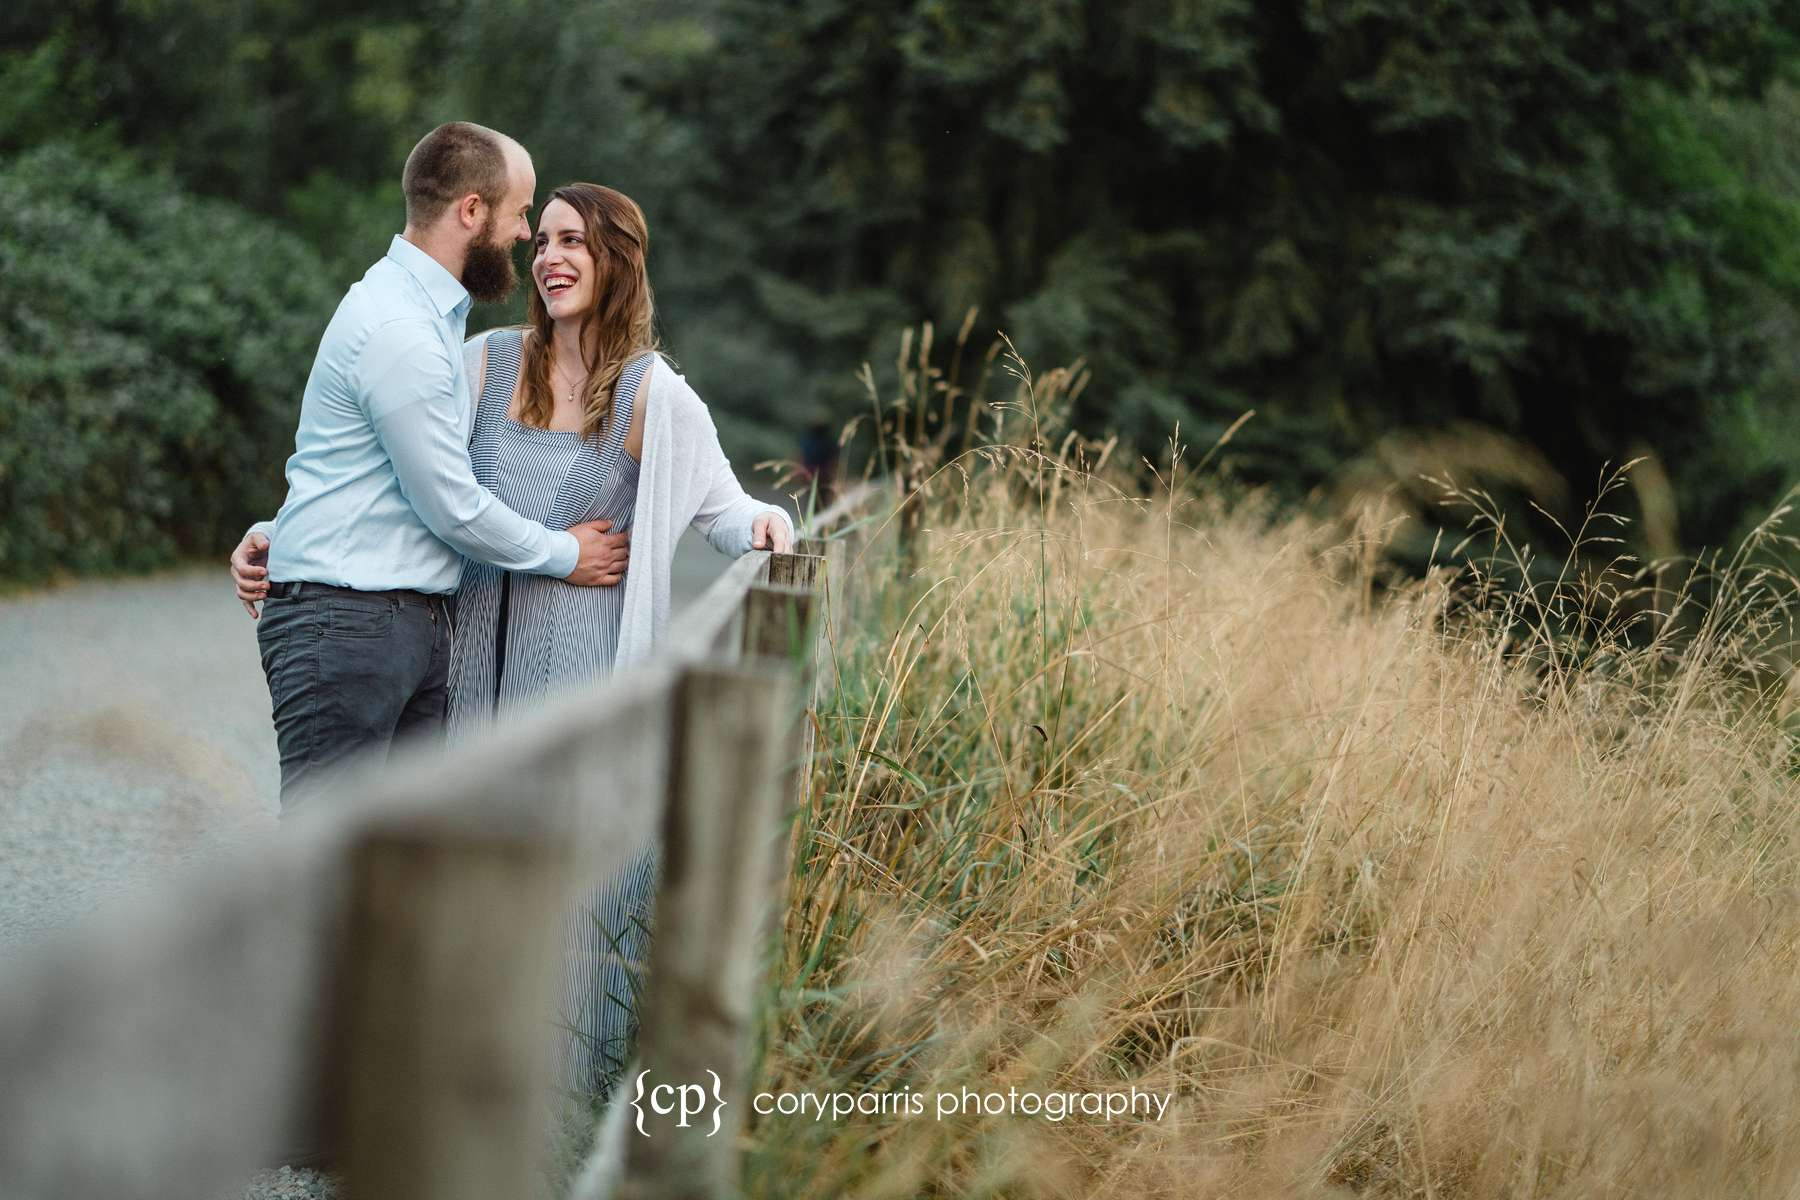 067-Engagement-Portraits-Marrymoor-Park.jpg